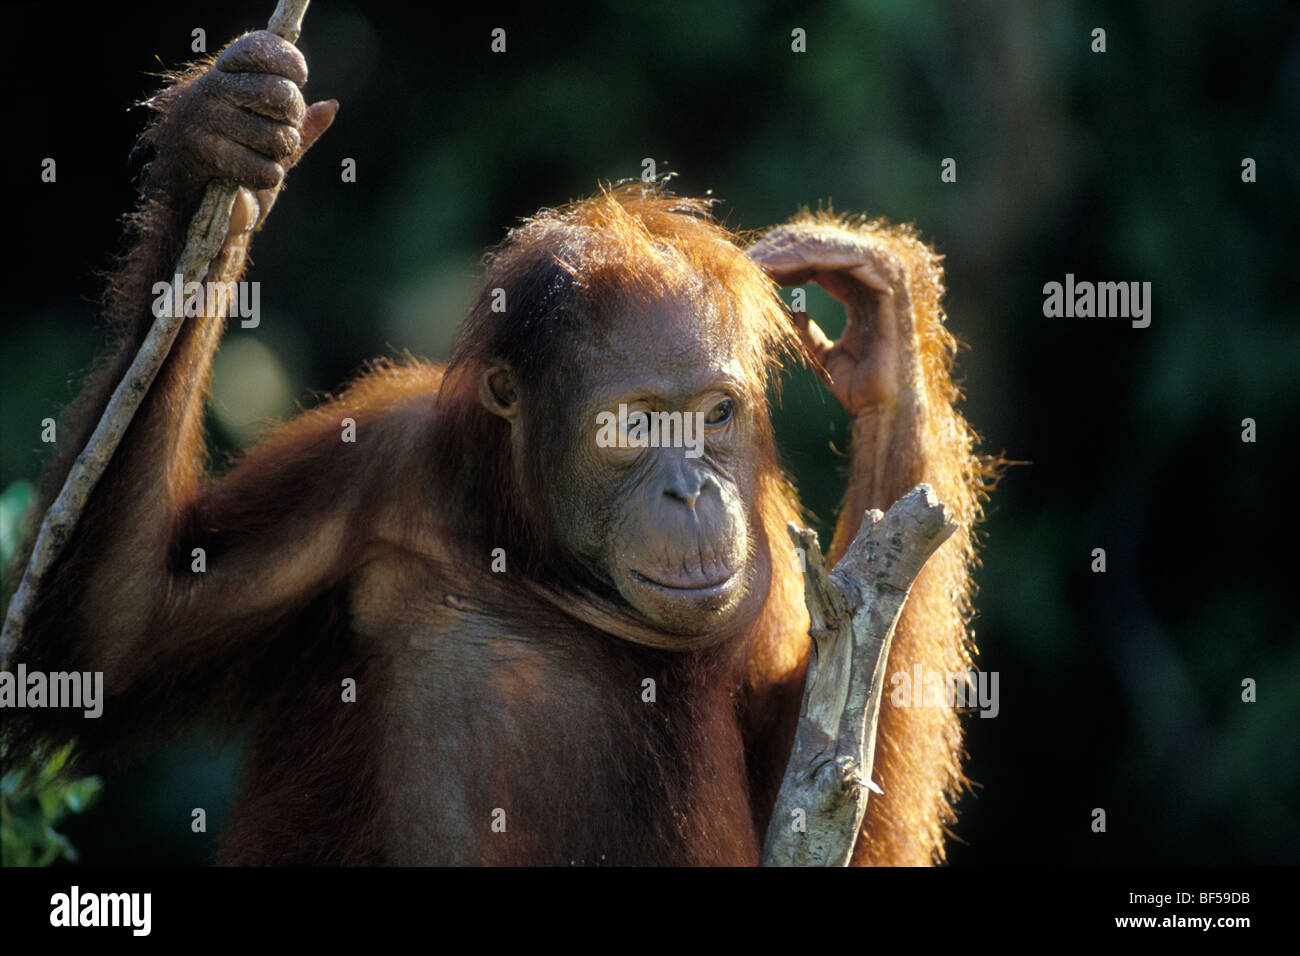 Young Orang Utan (Pongo pygmaeus) in tree, thoughtful, Tanjung Puting National Park, Borneo Stock Photo